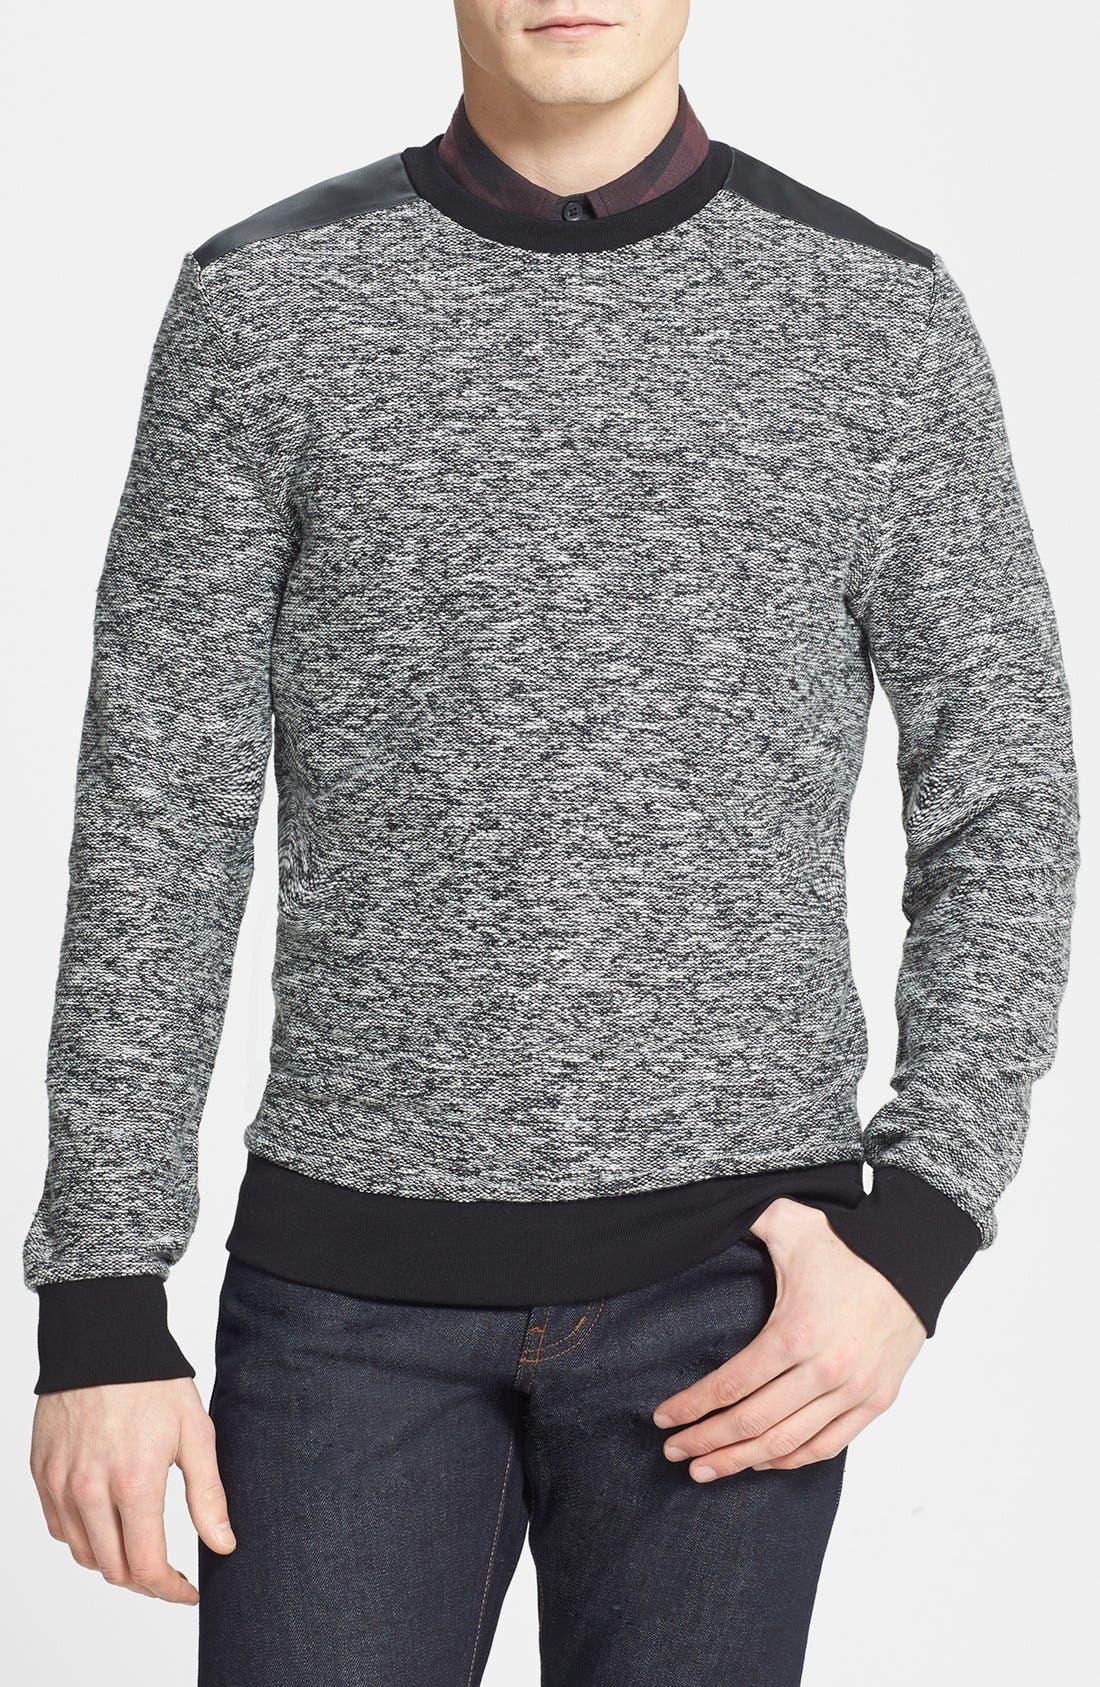 Alternate Image 1 Selected - Topman Crewneck Sweatshirt with Faux Leather Shoulder Trim